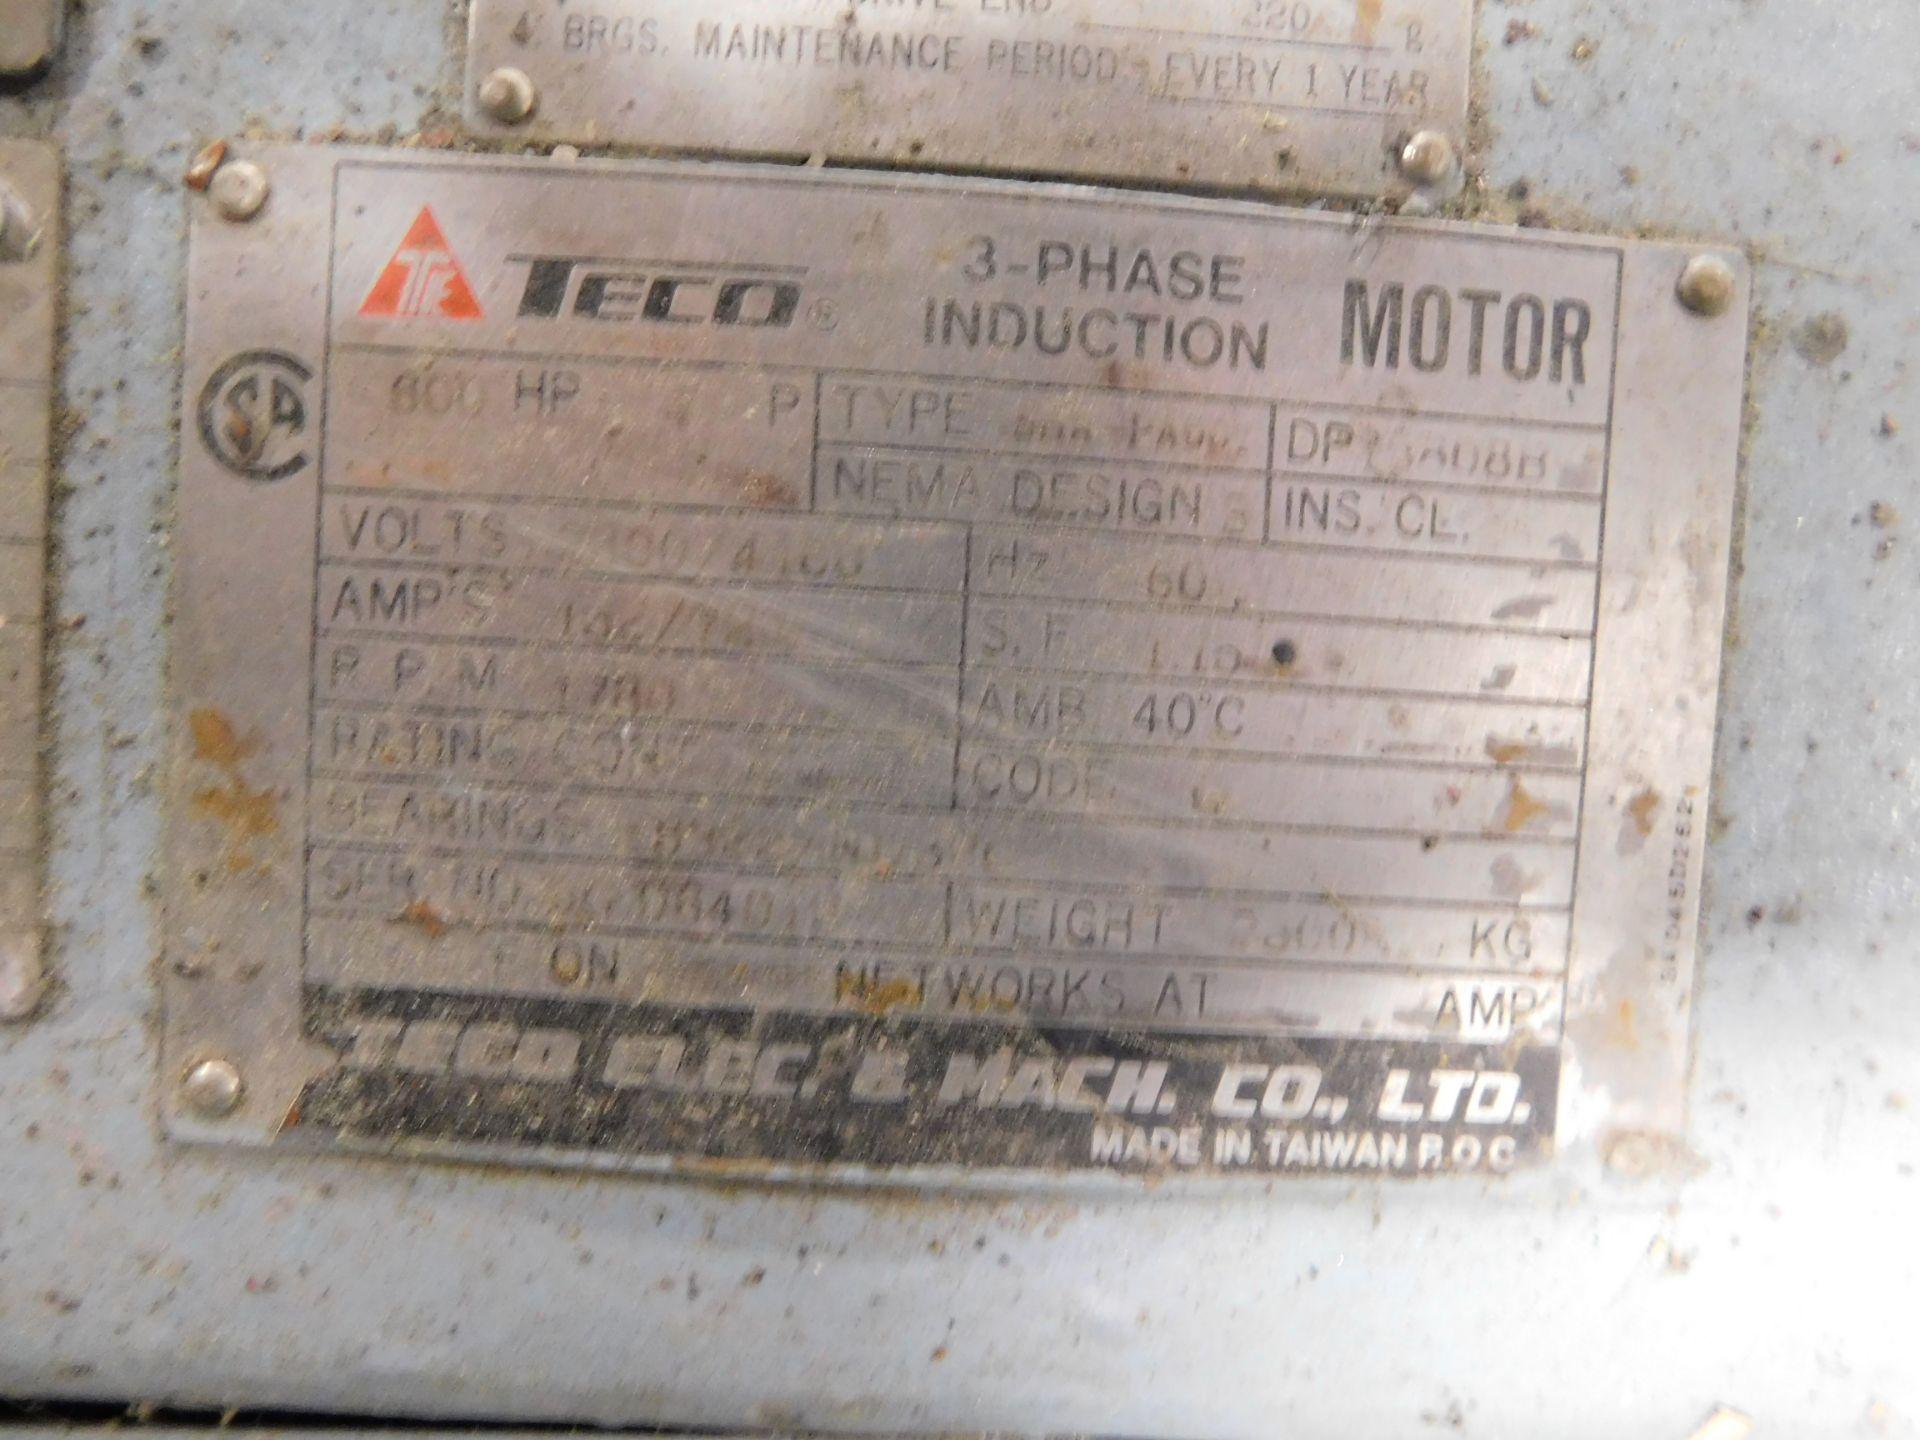 Teco Induction Motor. 600 HP. 3 Ph. 2300/4160 V. 60 Hz. 1780 RPM. 5808B. ASHA-PA001. - Image 5 of 6